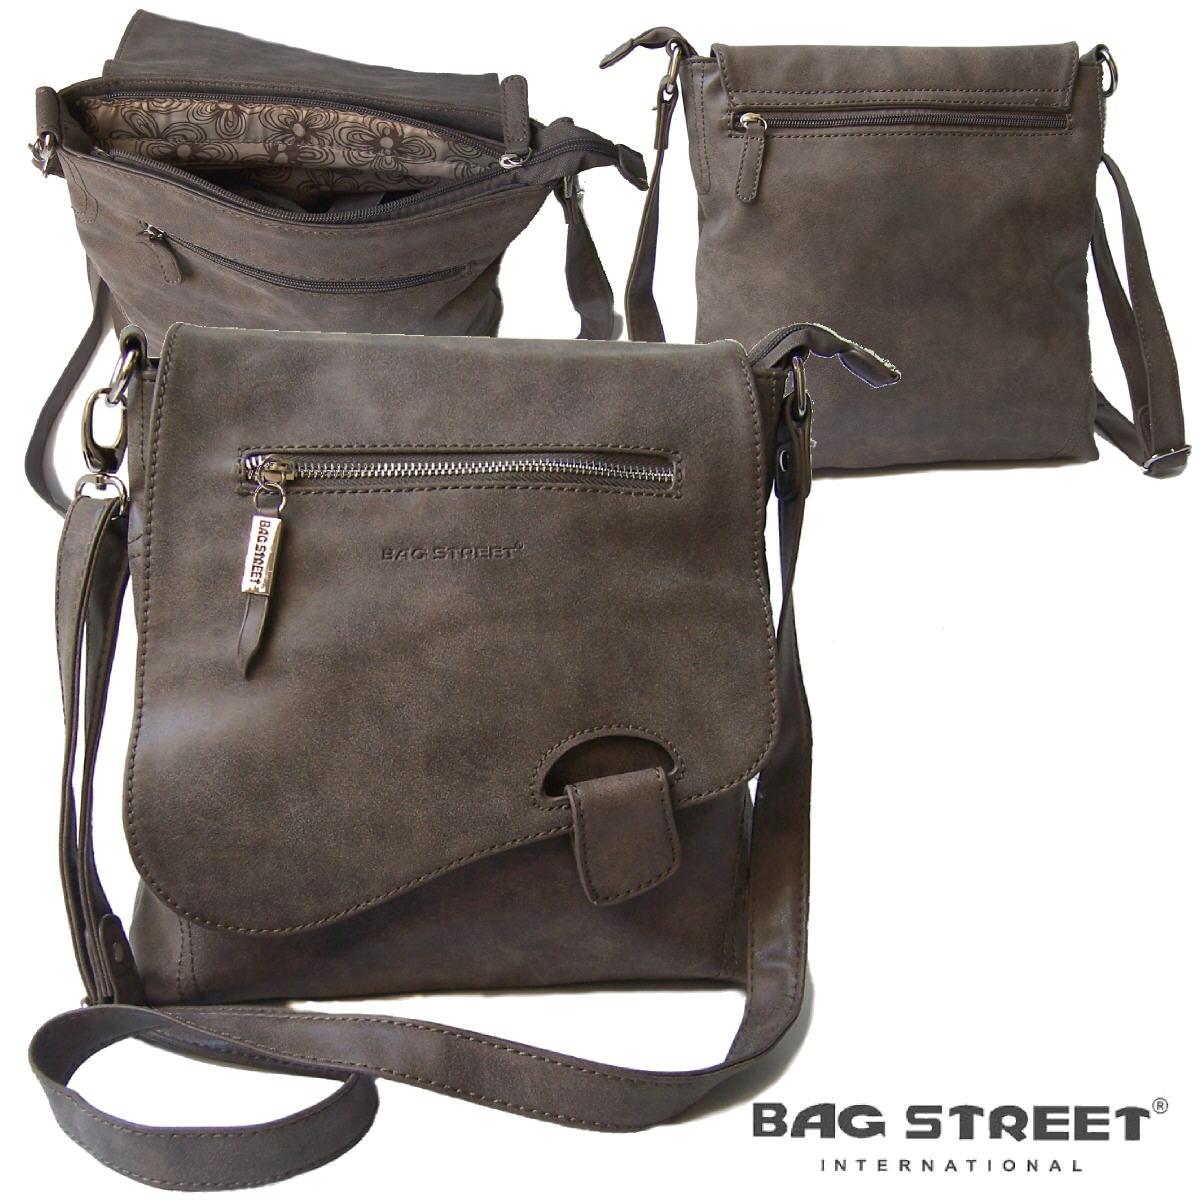 Umhängetasche Damen Tasche Handtasche usedLook taupe Bag Street Ta6008